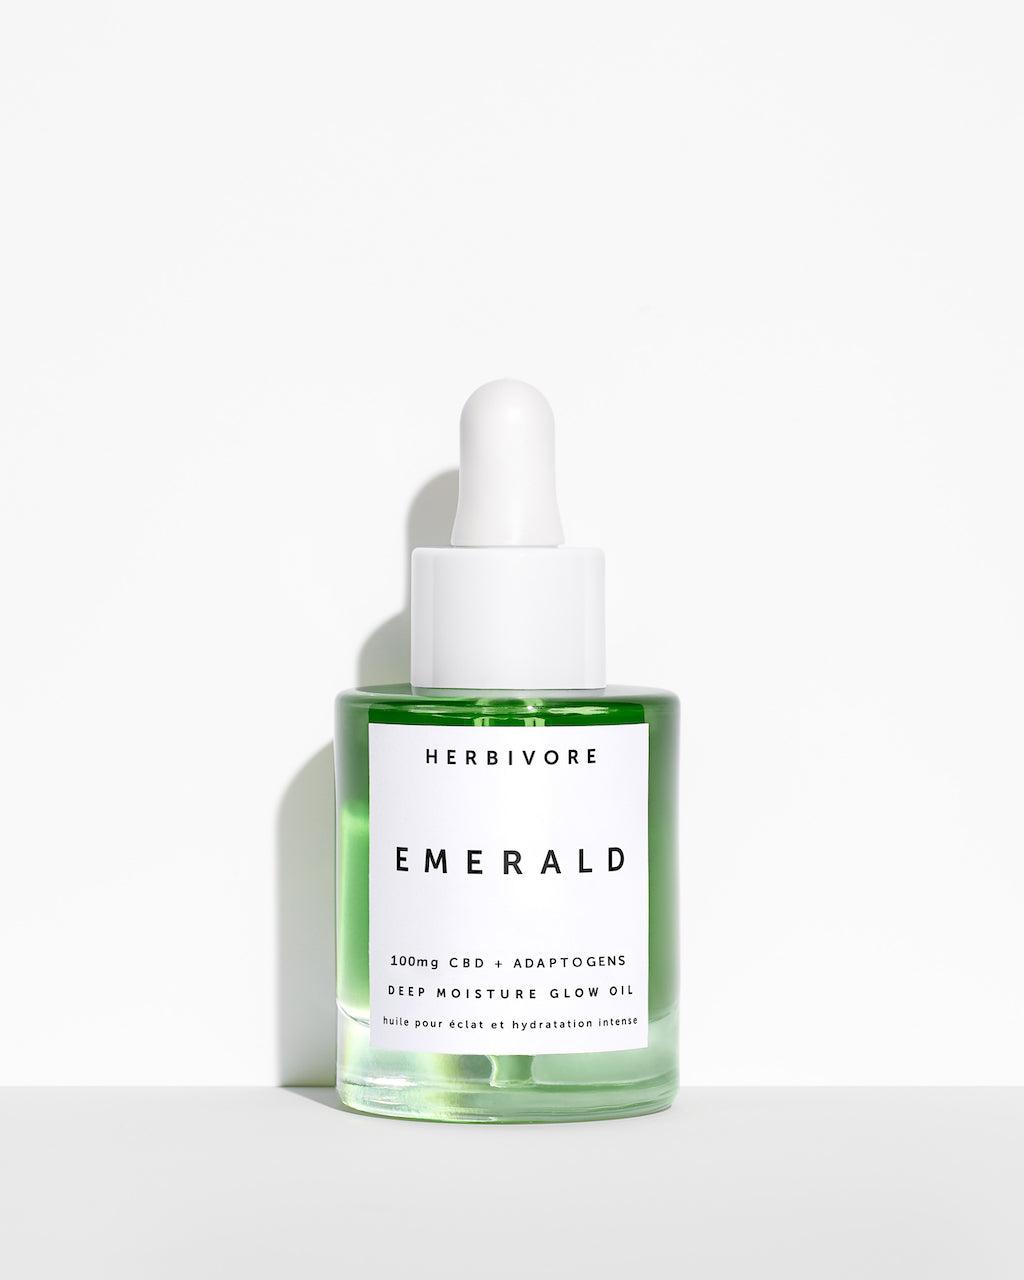 herbivorebotanicals - EMERALD CBD + Adaptogens Deep Moisture Glow Oil